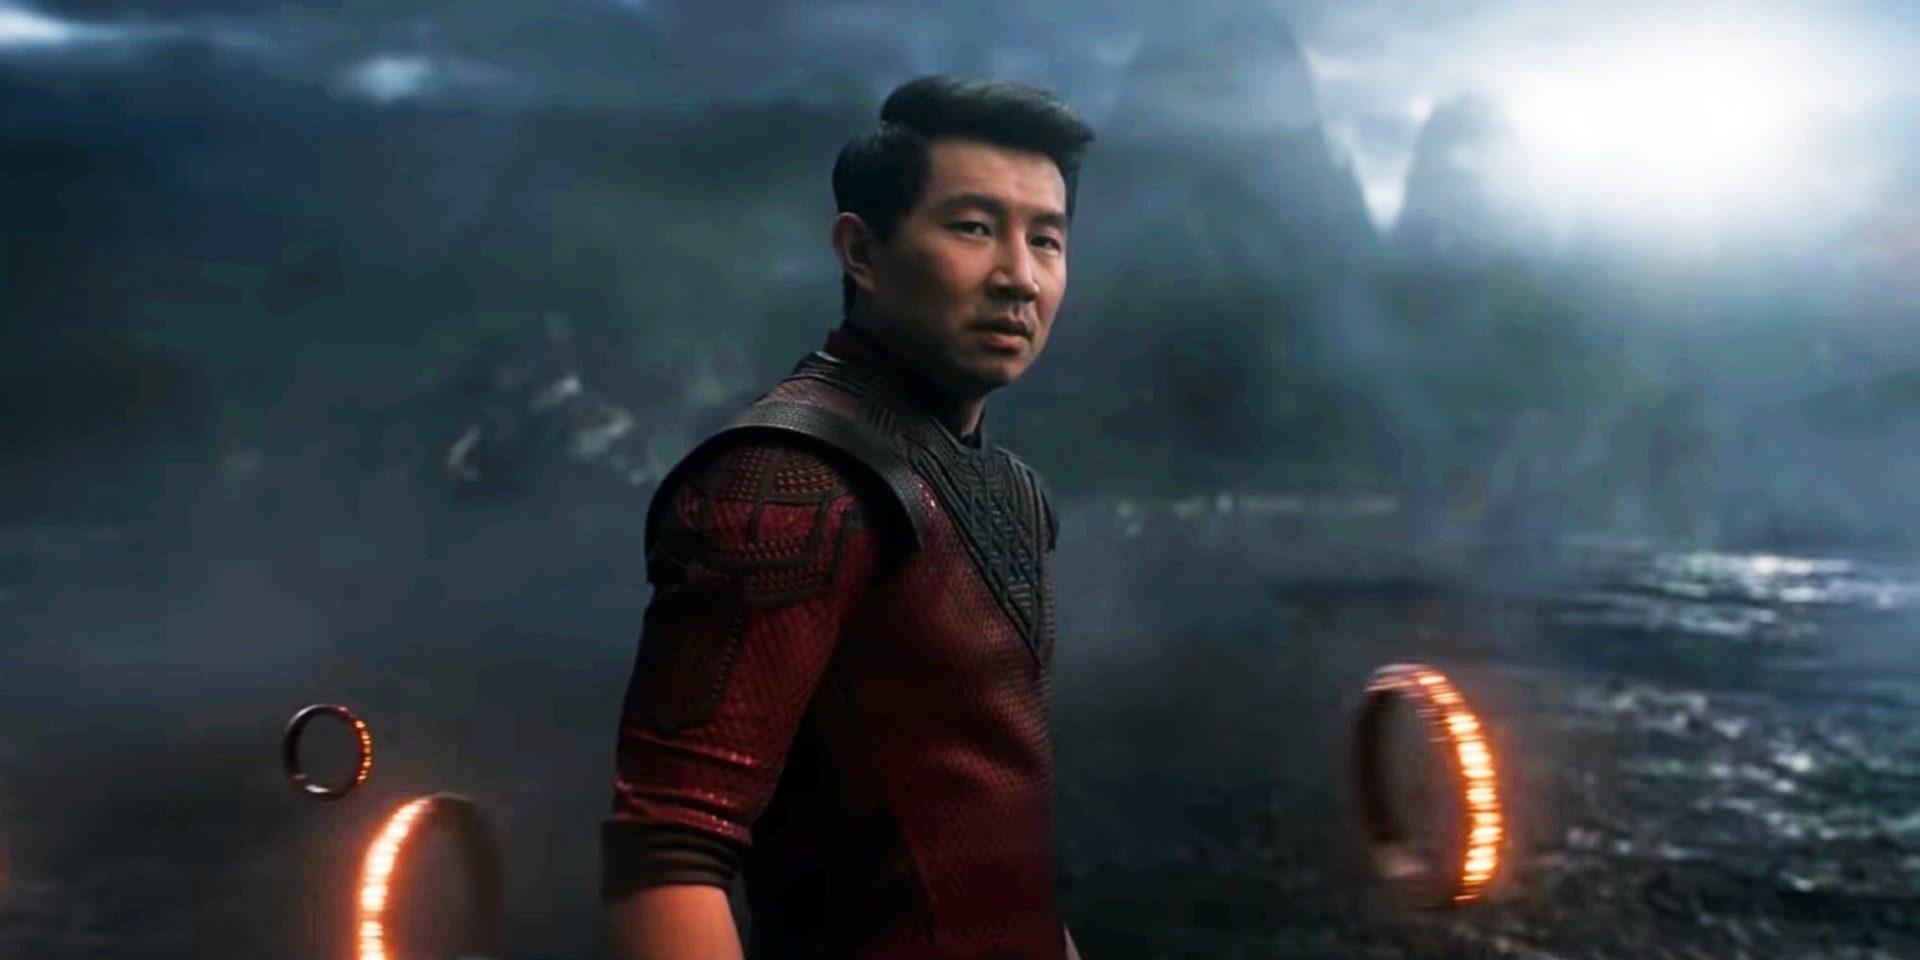 shang chi la leggenda dei dieci anelli film marvel 2021